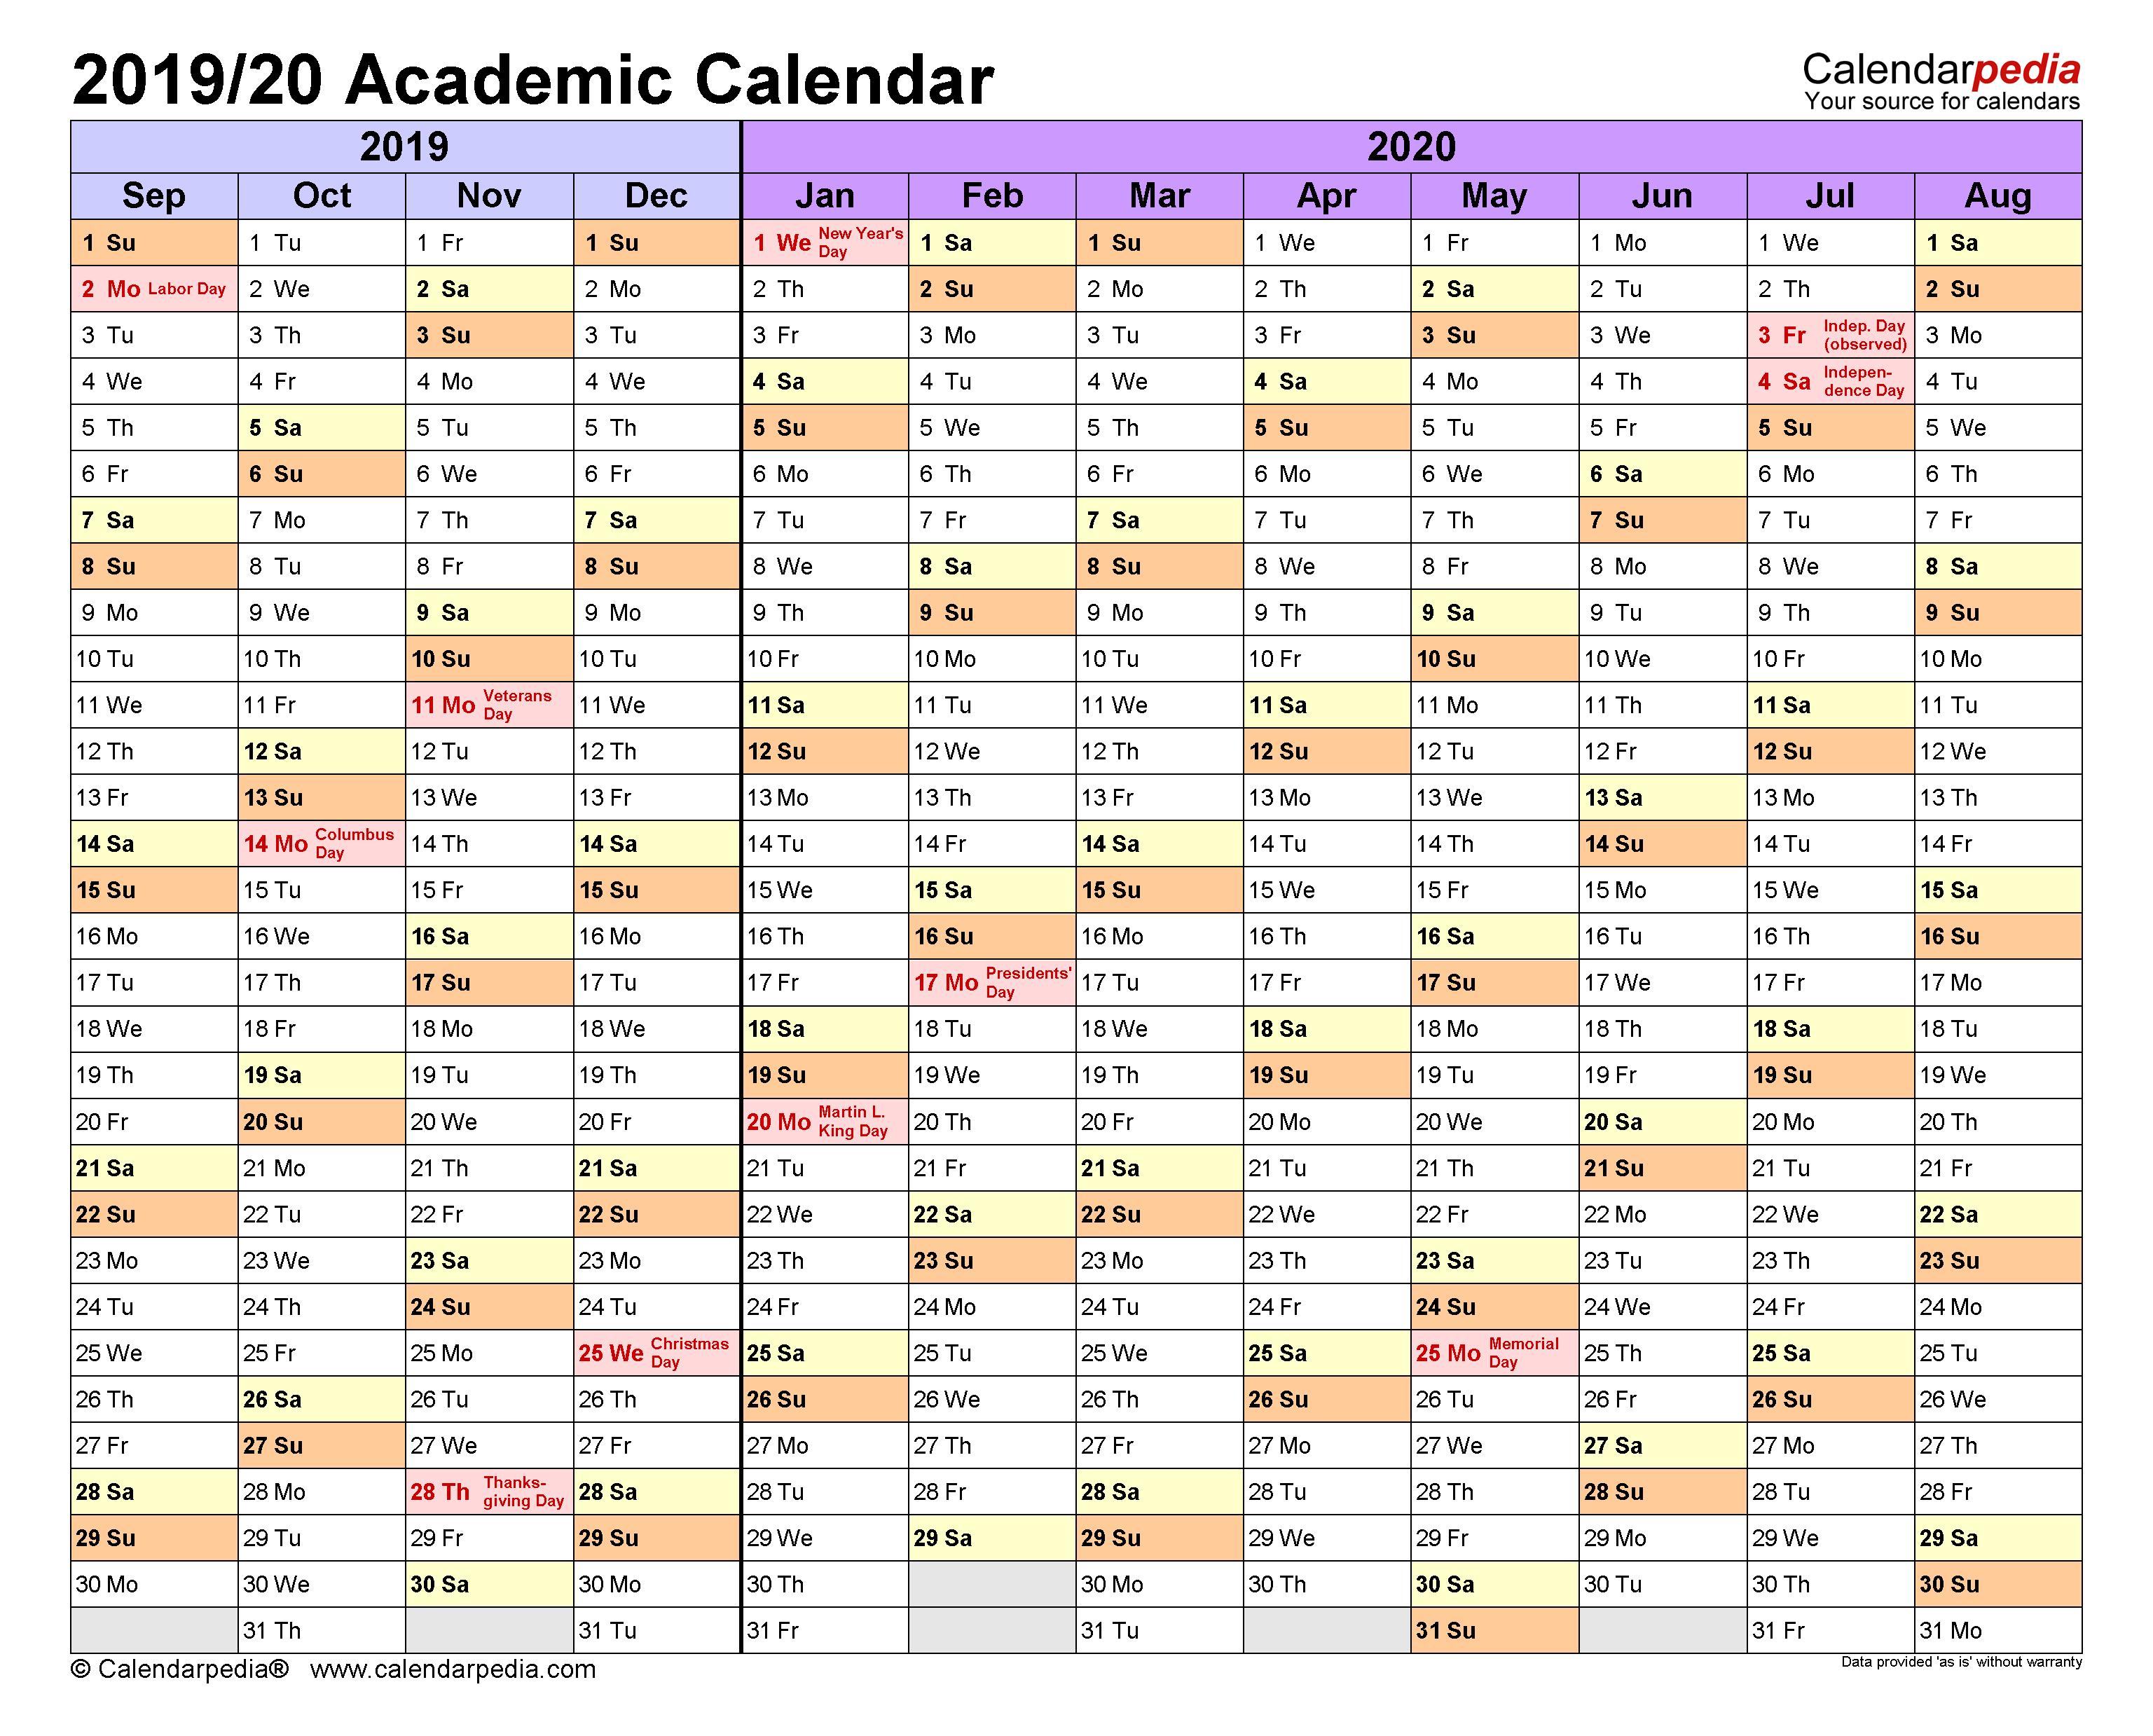 Academic Calendars 2019/2020 - Free Printable Word Templates with regard to Iowa State University Spring Semester Printable Calendar